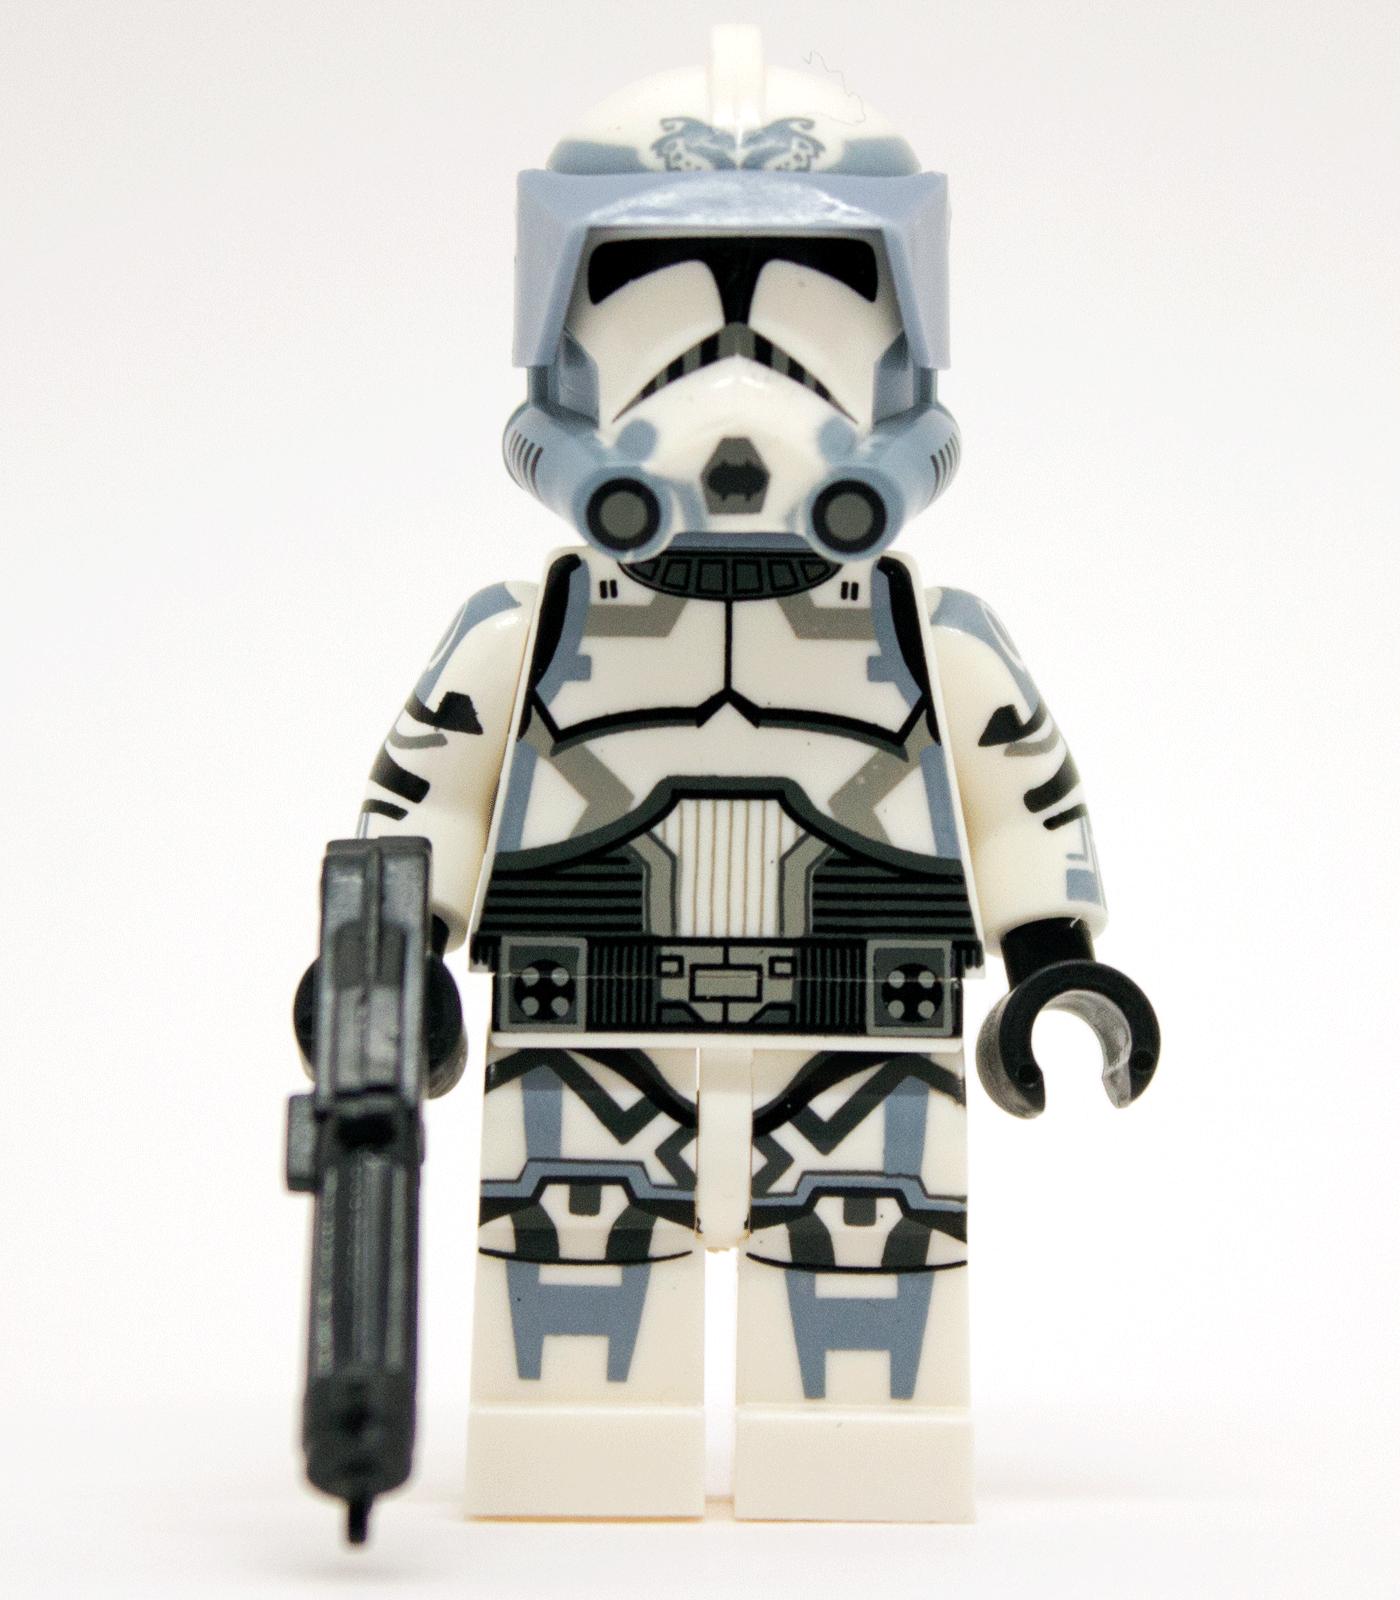 Lego 3 Minifigure Helmet 1 Darth Vader 2 Plain Clone Trooper Soldier Star Wars